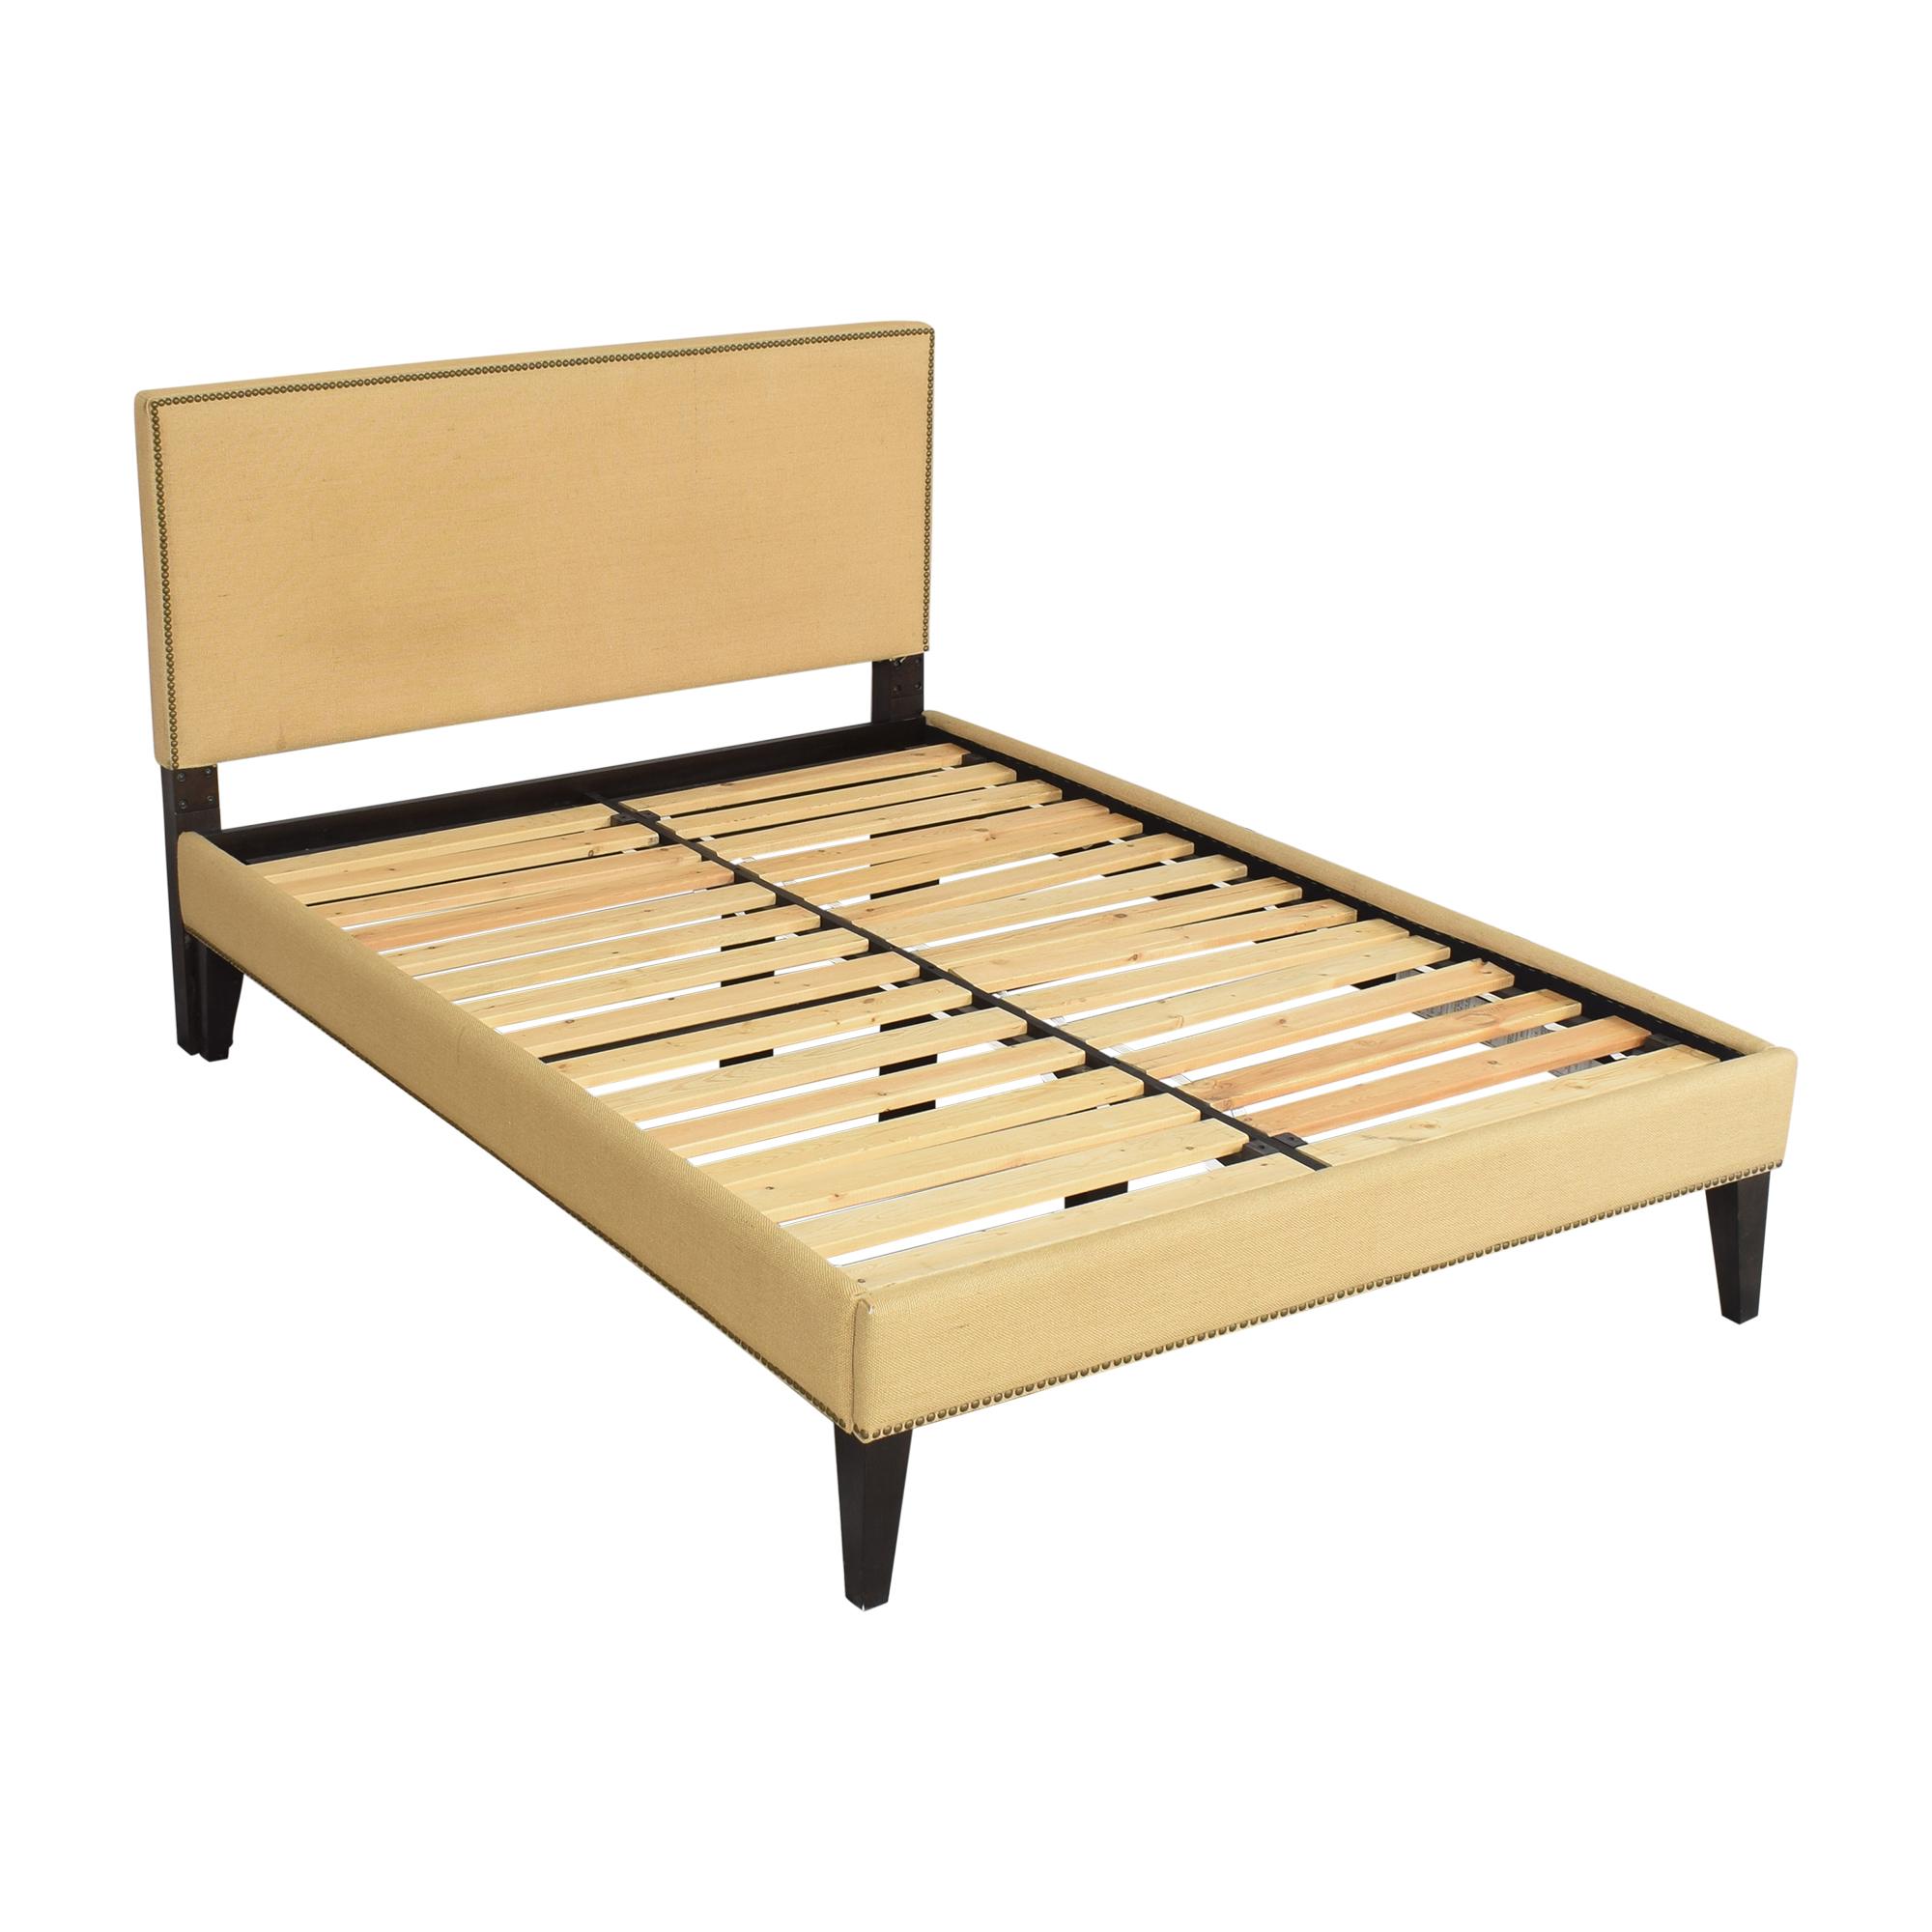 West Elm West Elm Upholstered Nailhead Full Bed on sale